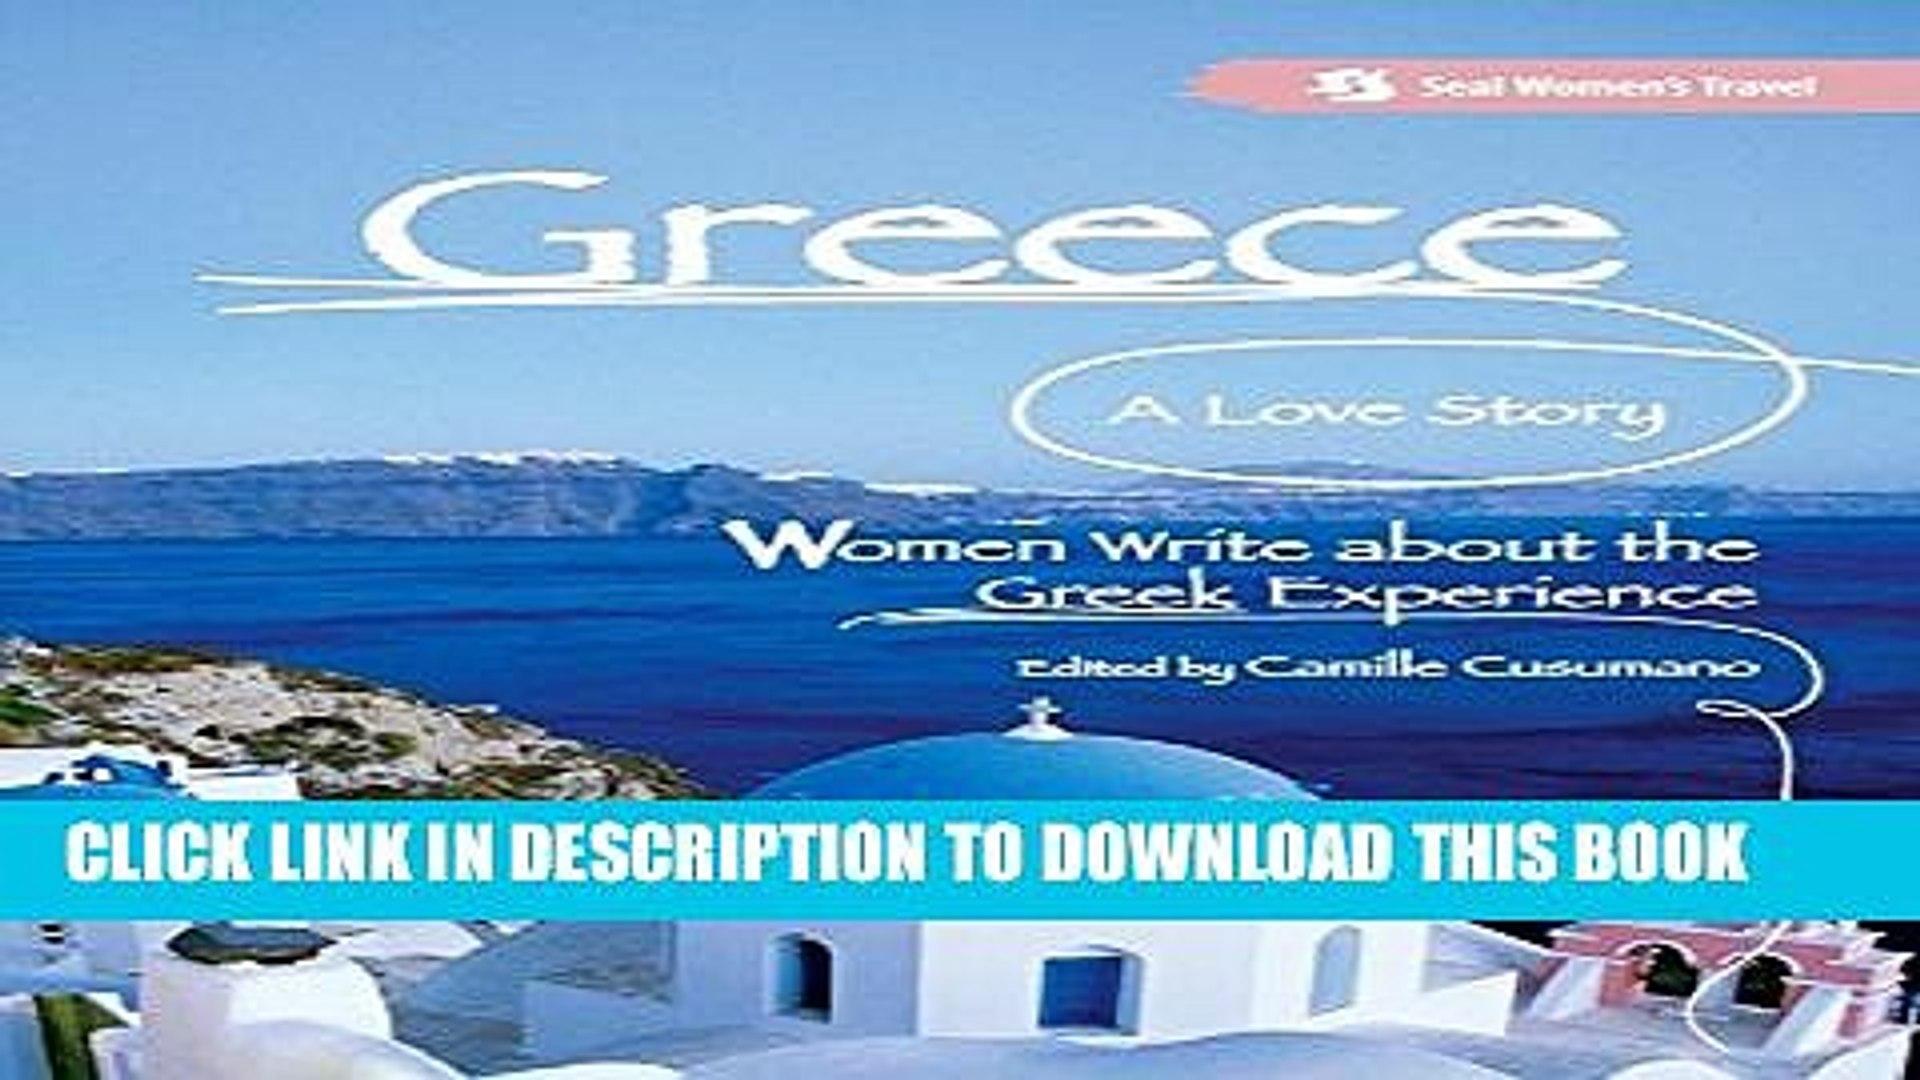 [PDF] Greece, A Love Story: Women Write about the Greek Experience (Seal Women s Travel) Full Online